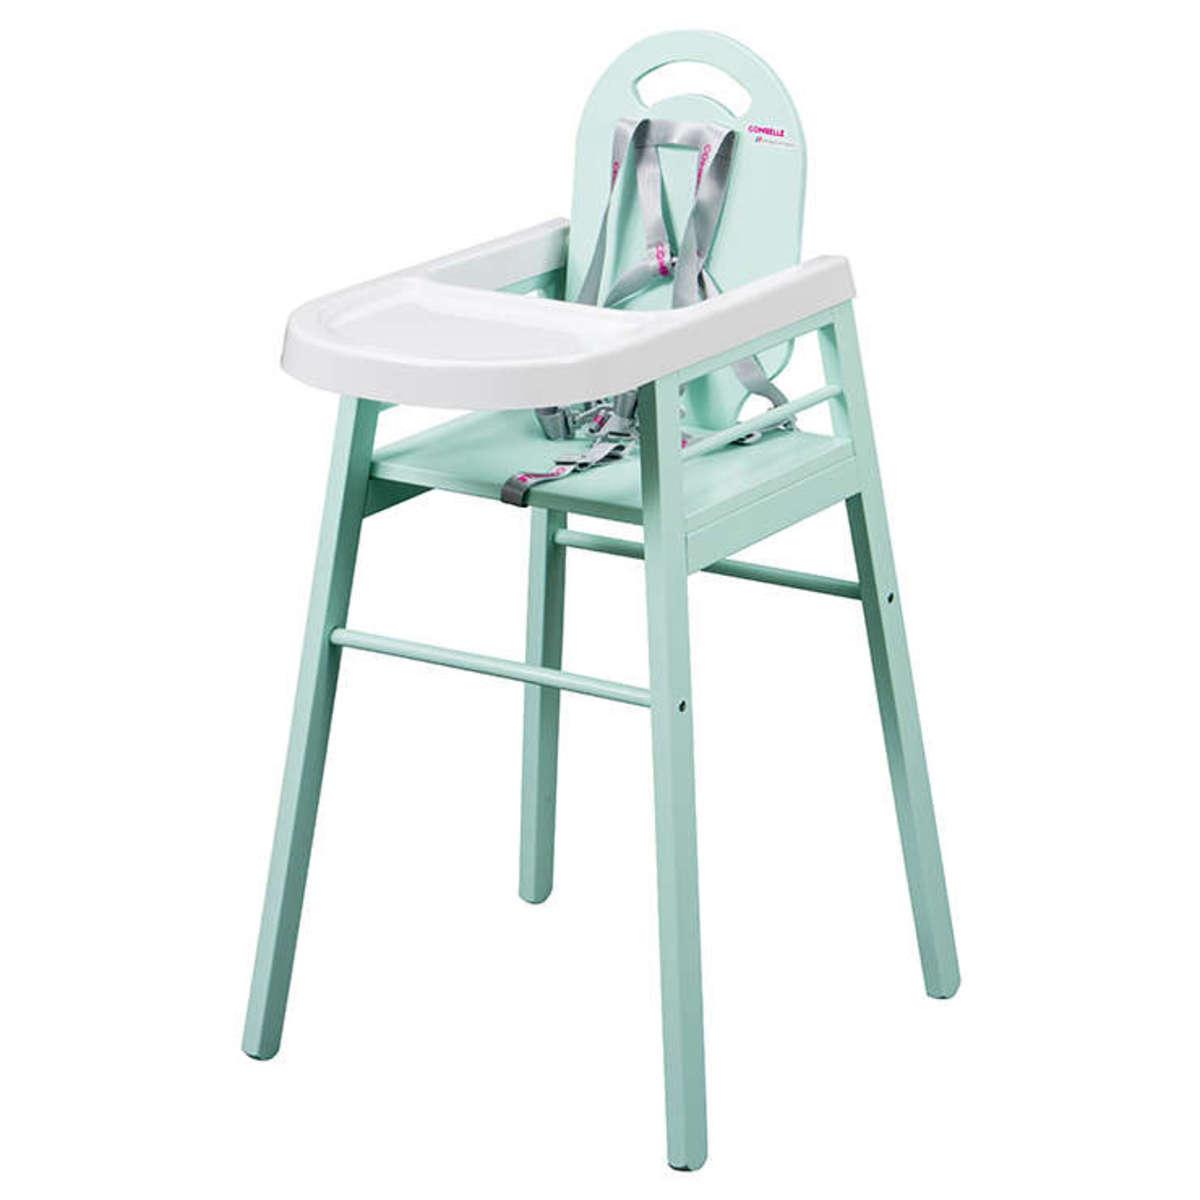 Chaise haute Chaise Haute Fixe Lili - Vert Mint Chaise Haute Fixe Lili - Vert Mint